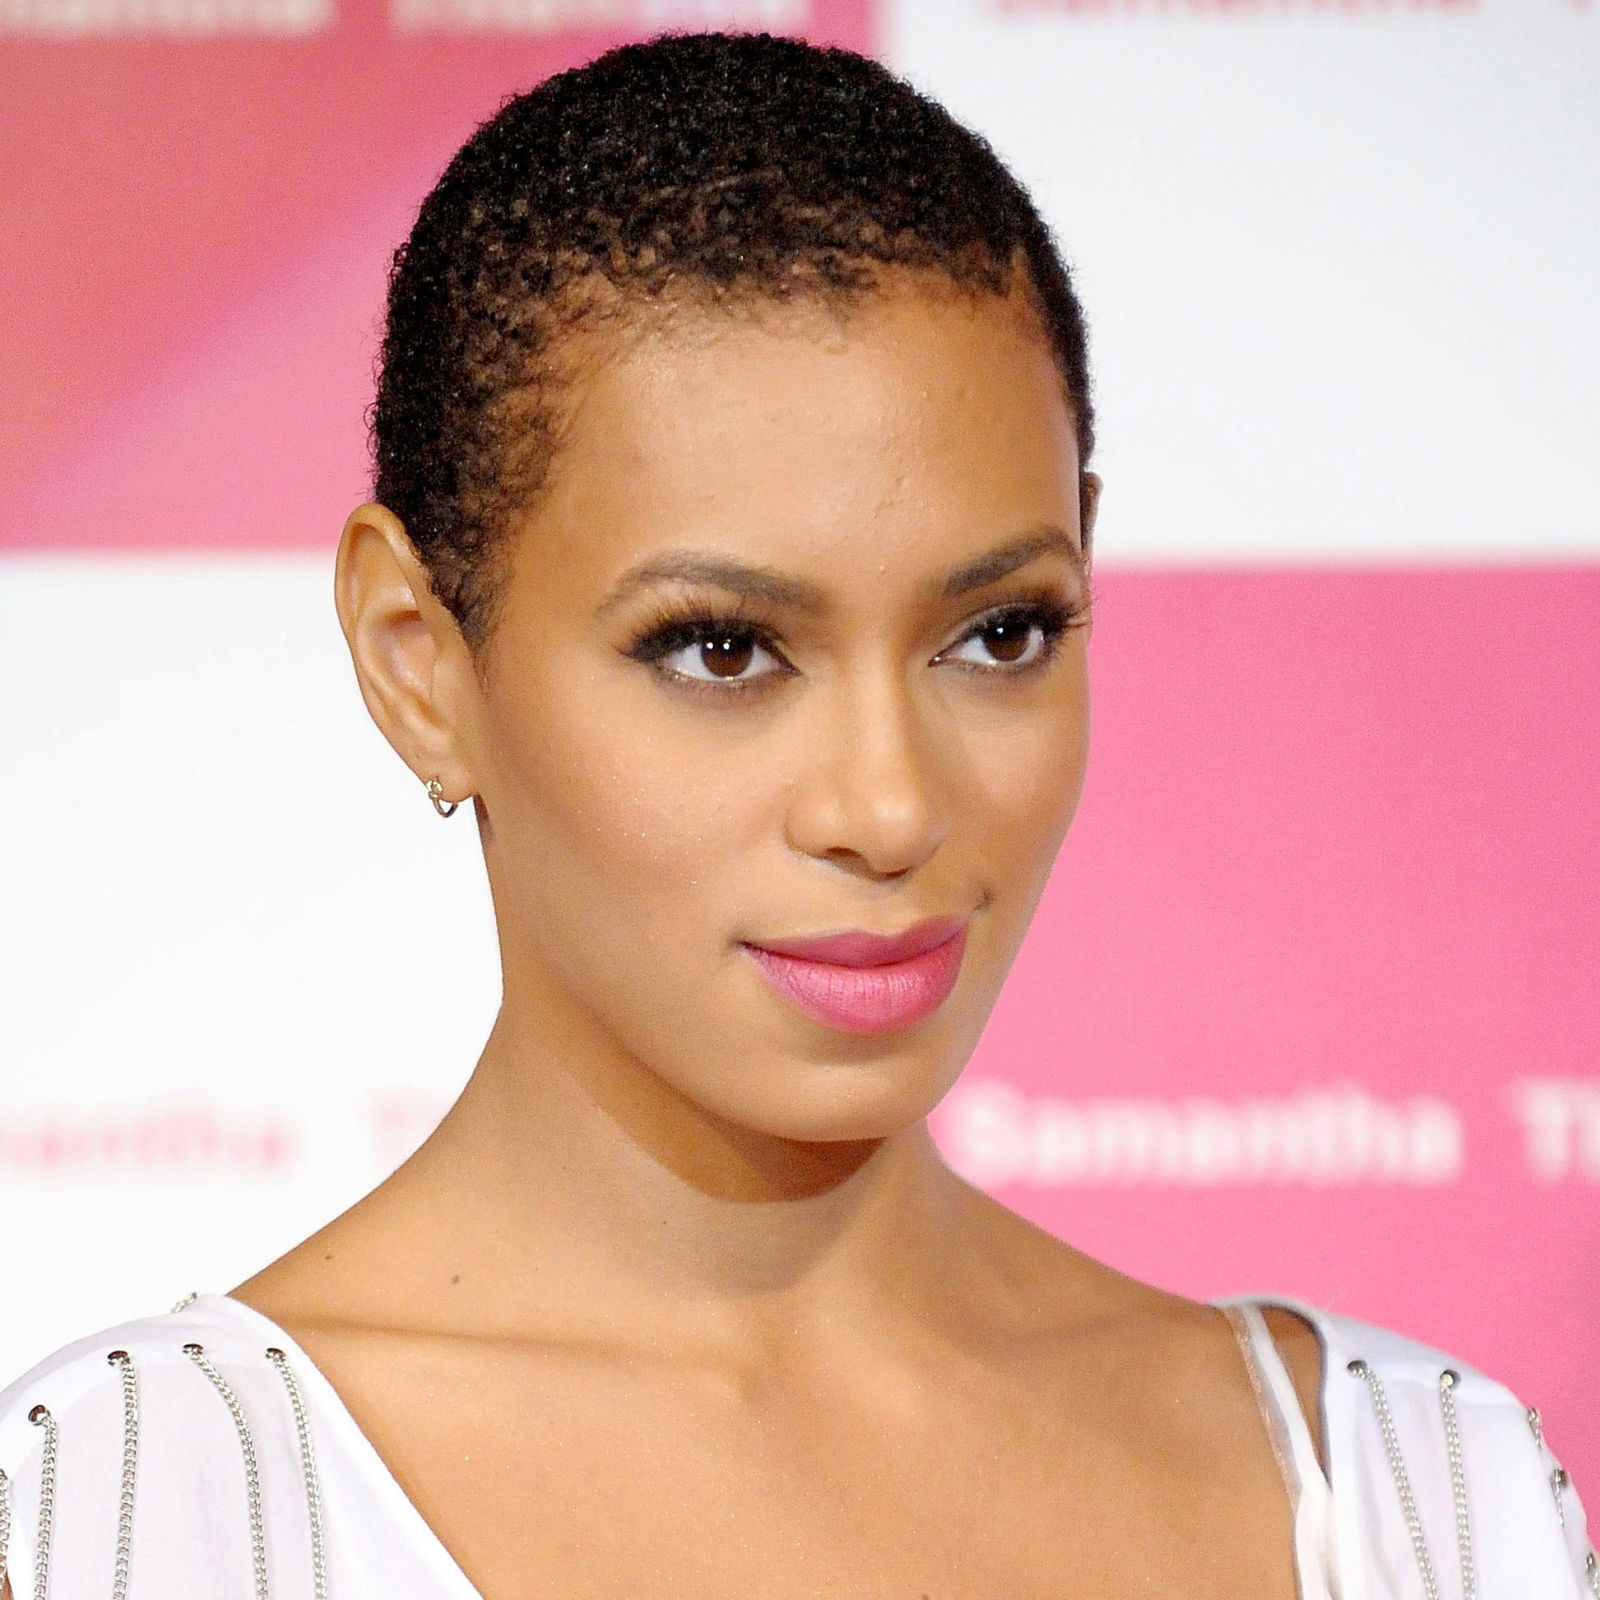 Pleasing Jazzy Black Women Short Hairstyles 2016 Hairstyles 2016 Hair Short Hairstyles For Black Women Fulllsitofus